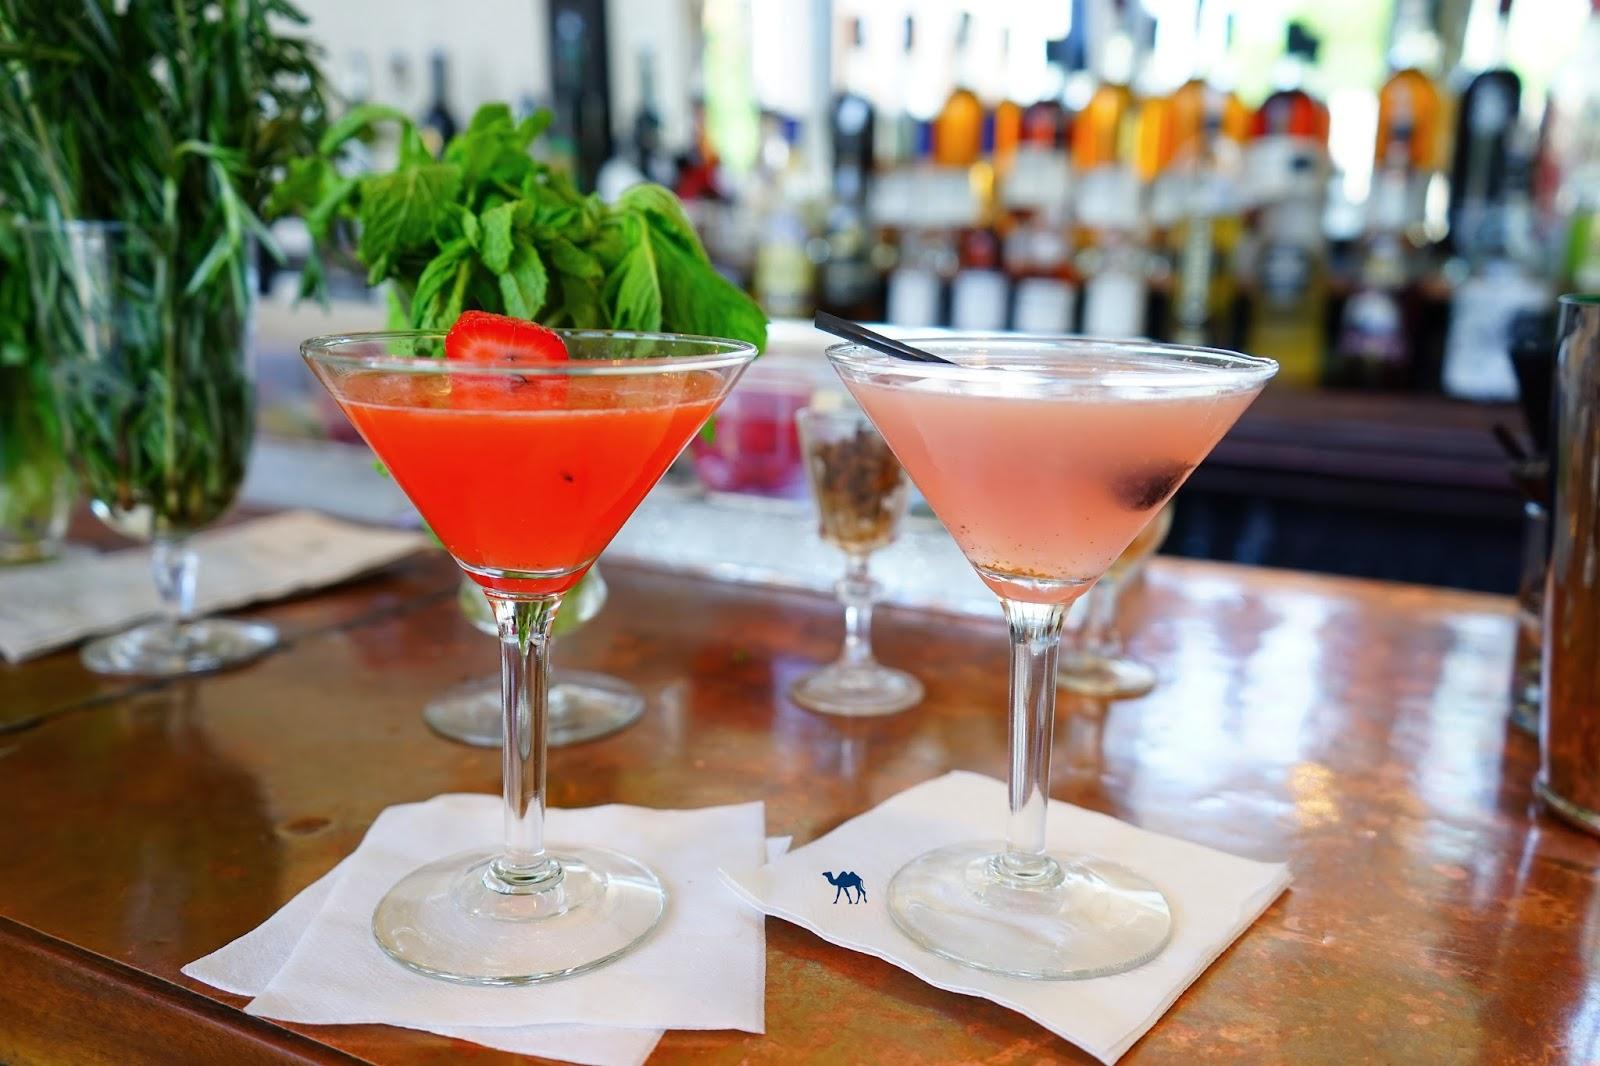 Le Chameau Bleu - Cocktails du botanica Bar à Red Hook  New York USA